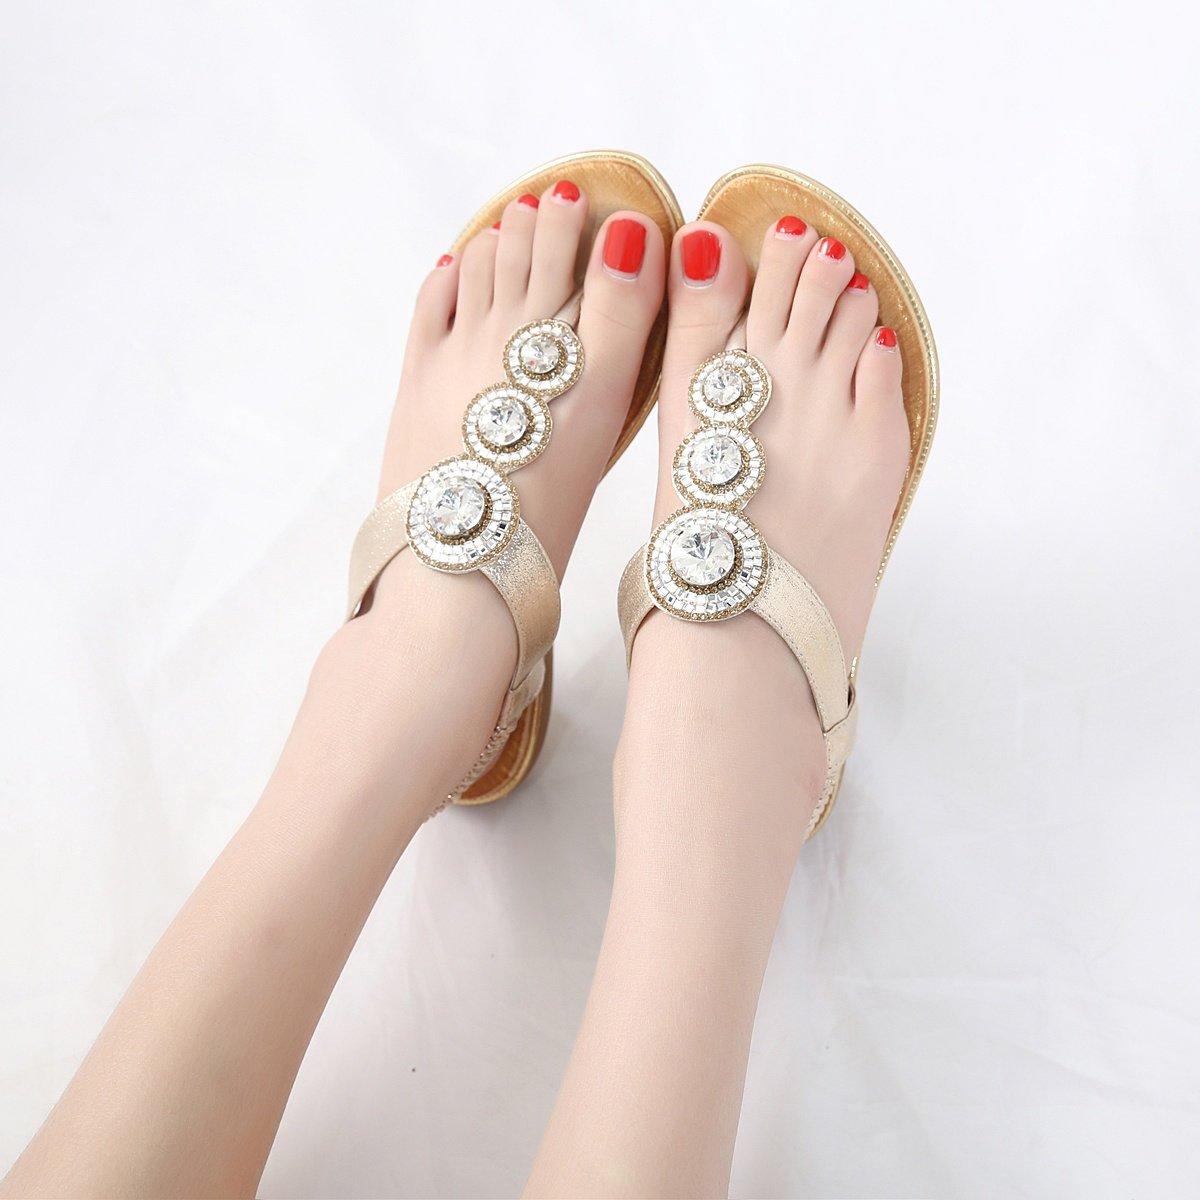 Meeshine Womens Flat Sandals Summer Rhinestone Comfort Bohemian Flip Flop Shoes Gold-02 US 8.5 by Meeshine (Image #6)